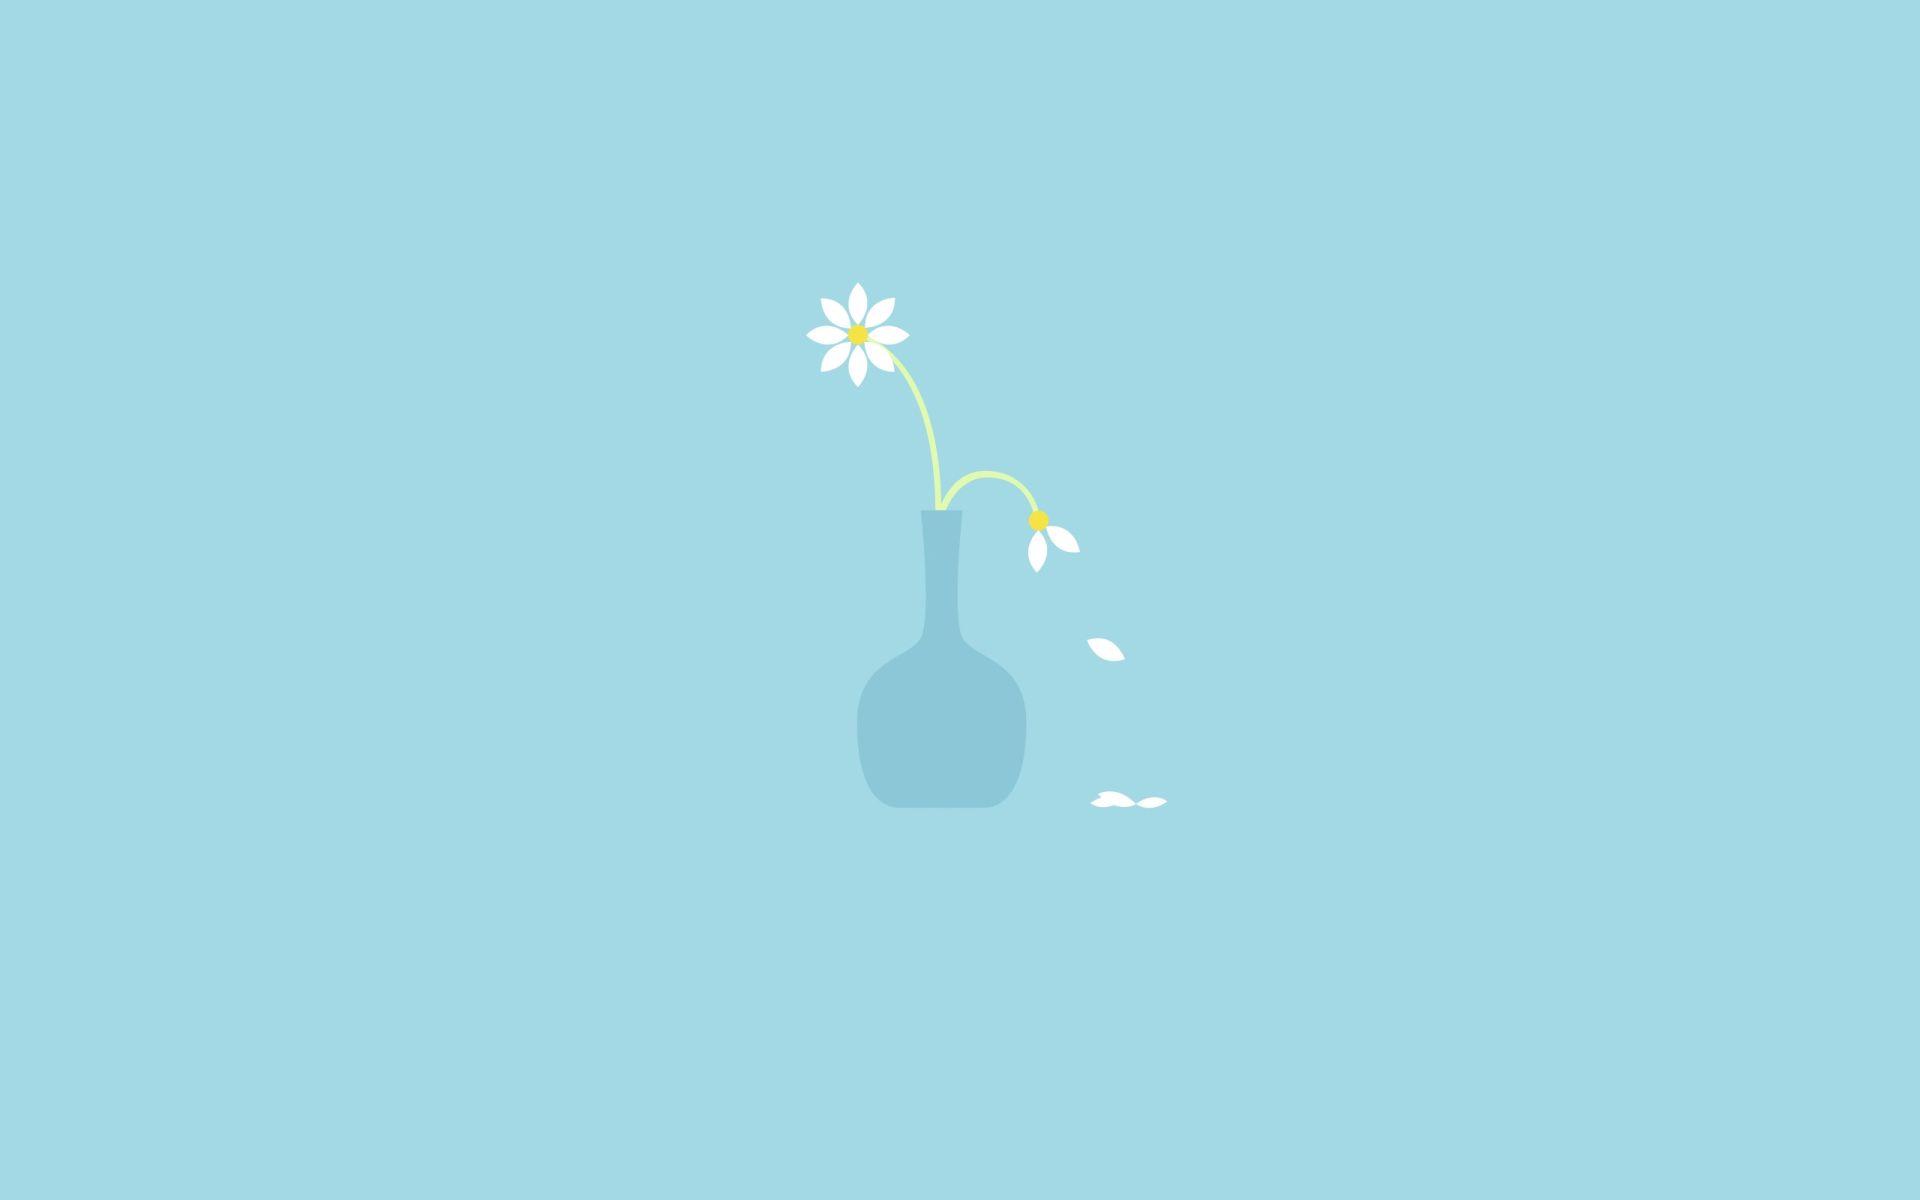 Cute Blue Flowers Minimalist PC Wallpaper HD